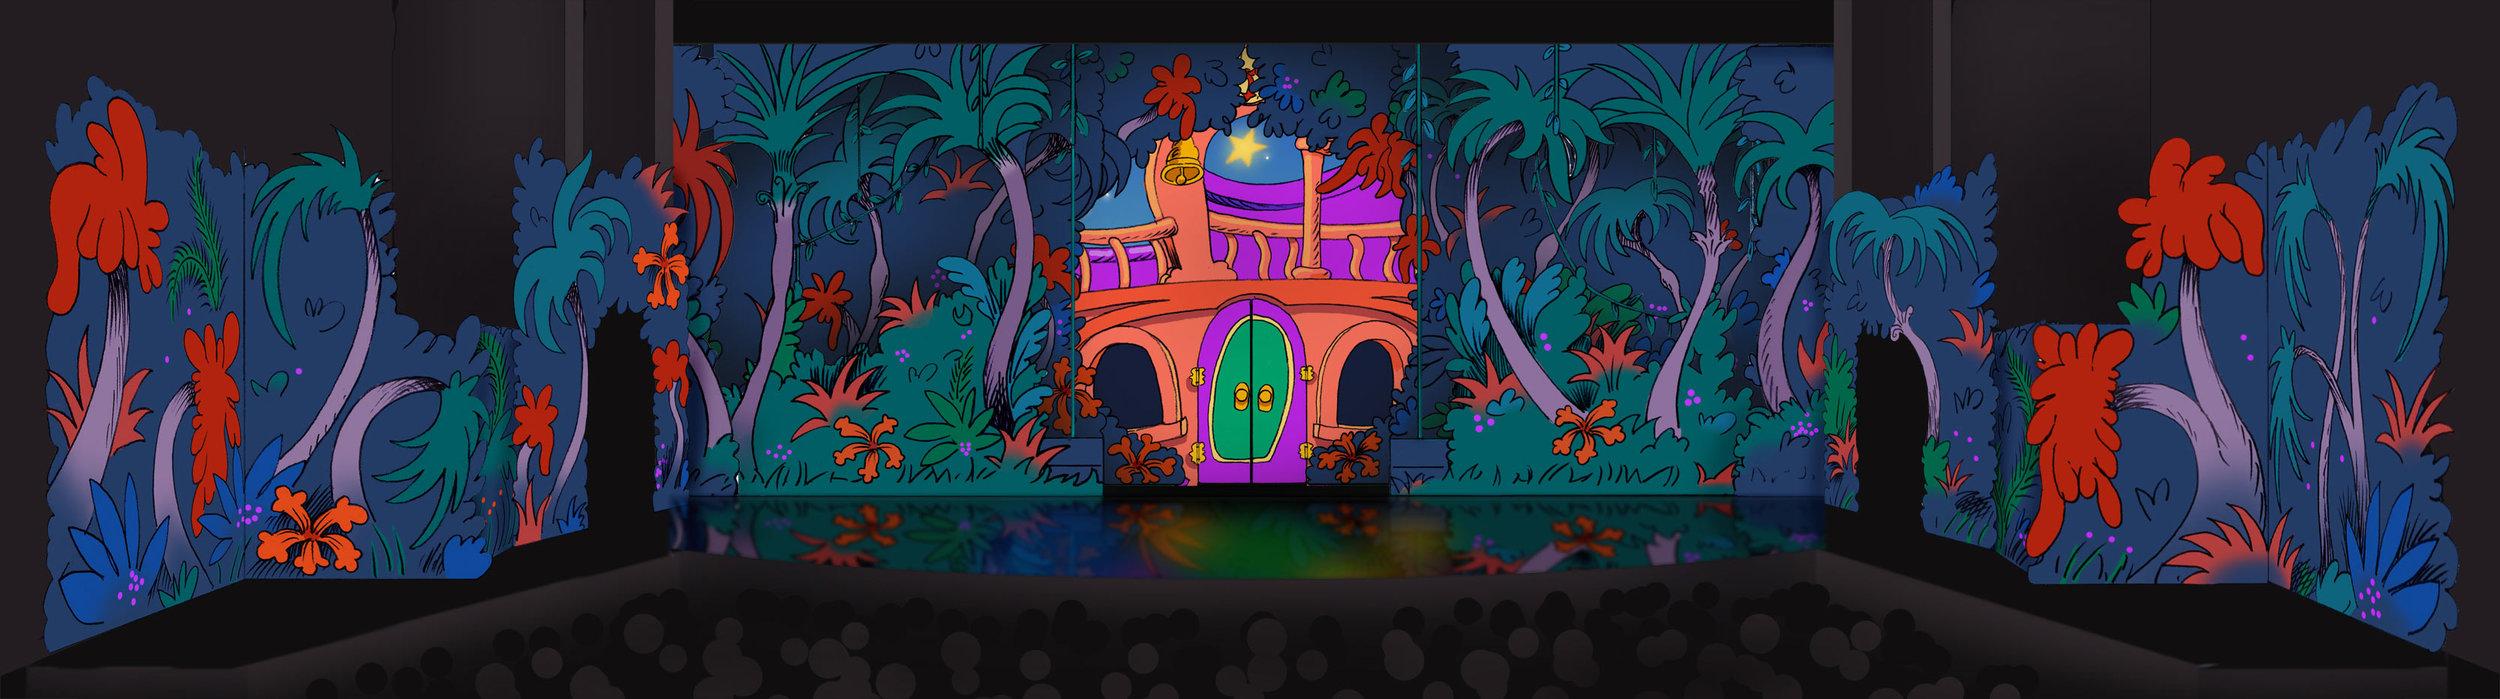 Seusical-Jungle-web.jpg